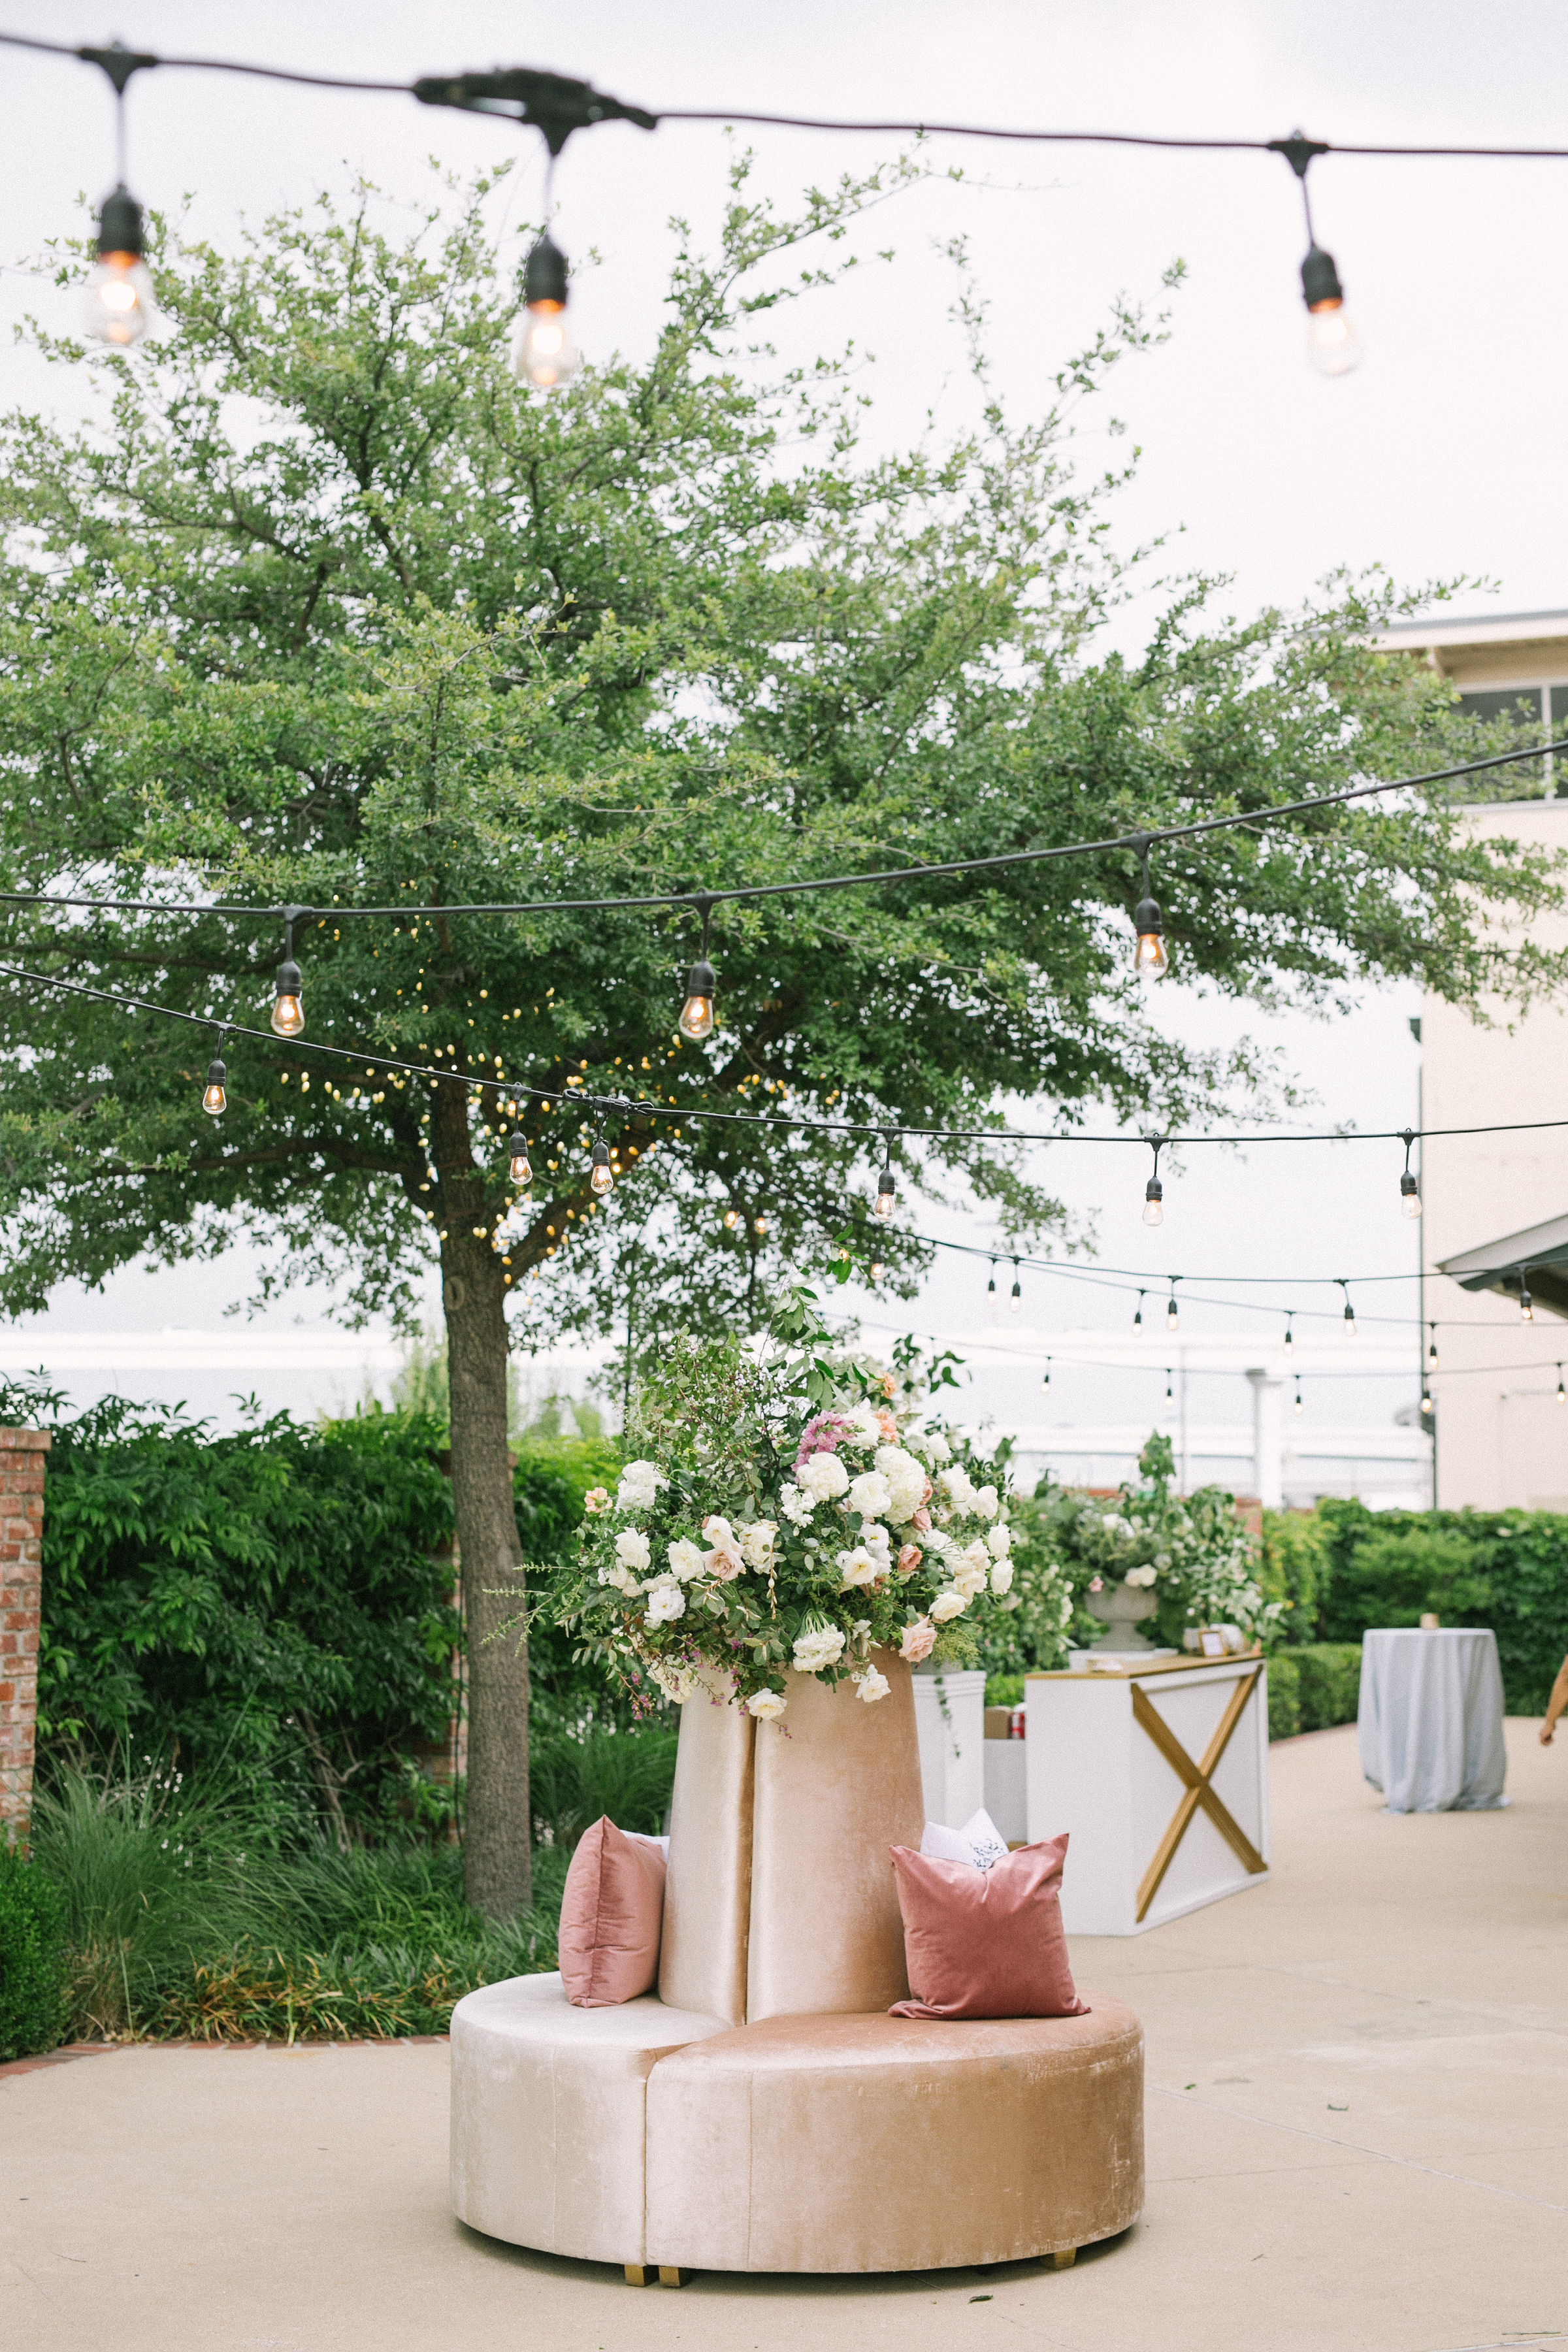 Ellen-Ashton-Photography-Girt-and-gold-events-weddings-Ashton-Depot-Weddings1039.jpg